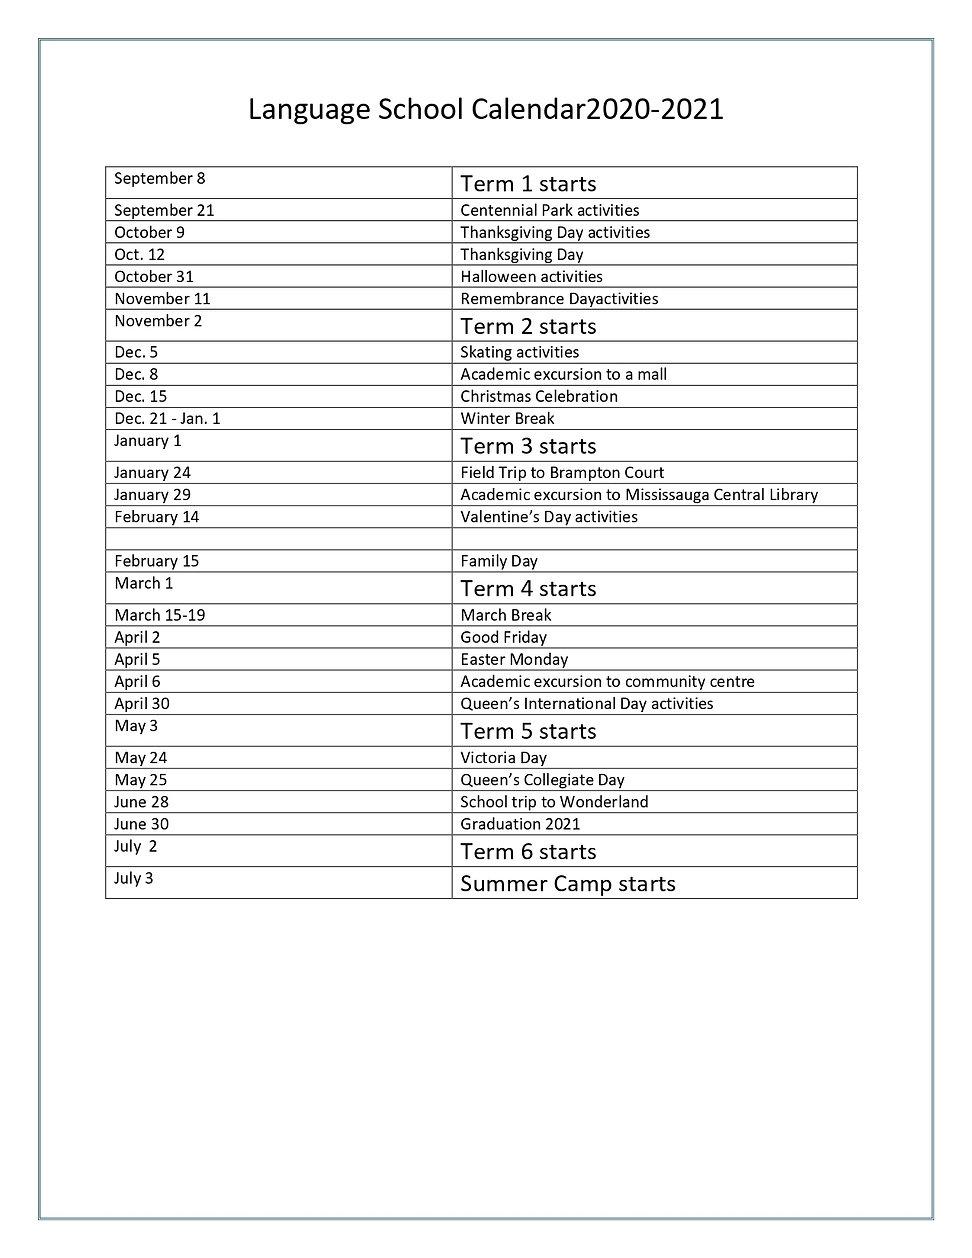 2020 language school calendar - list of